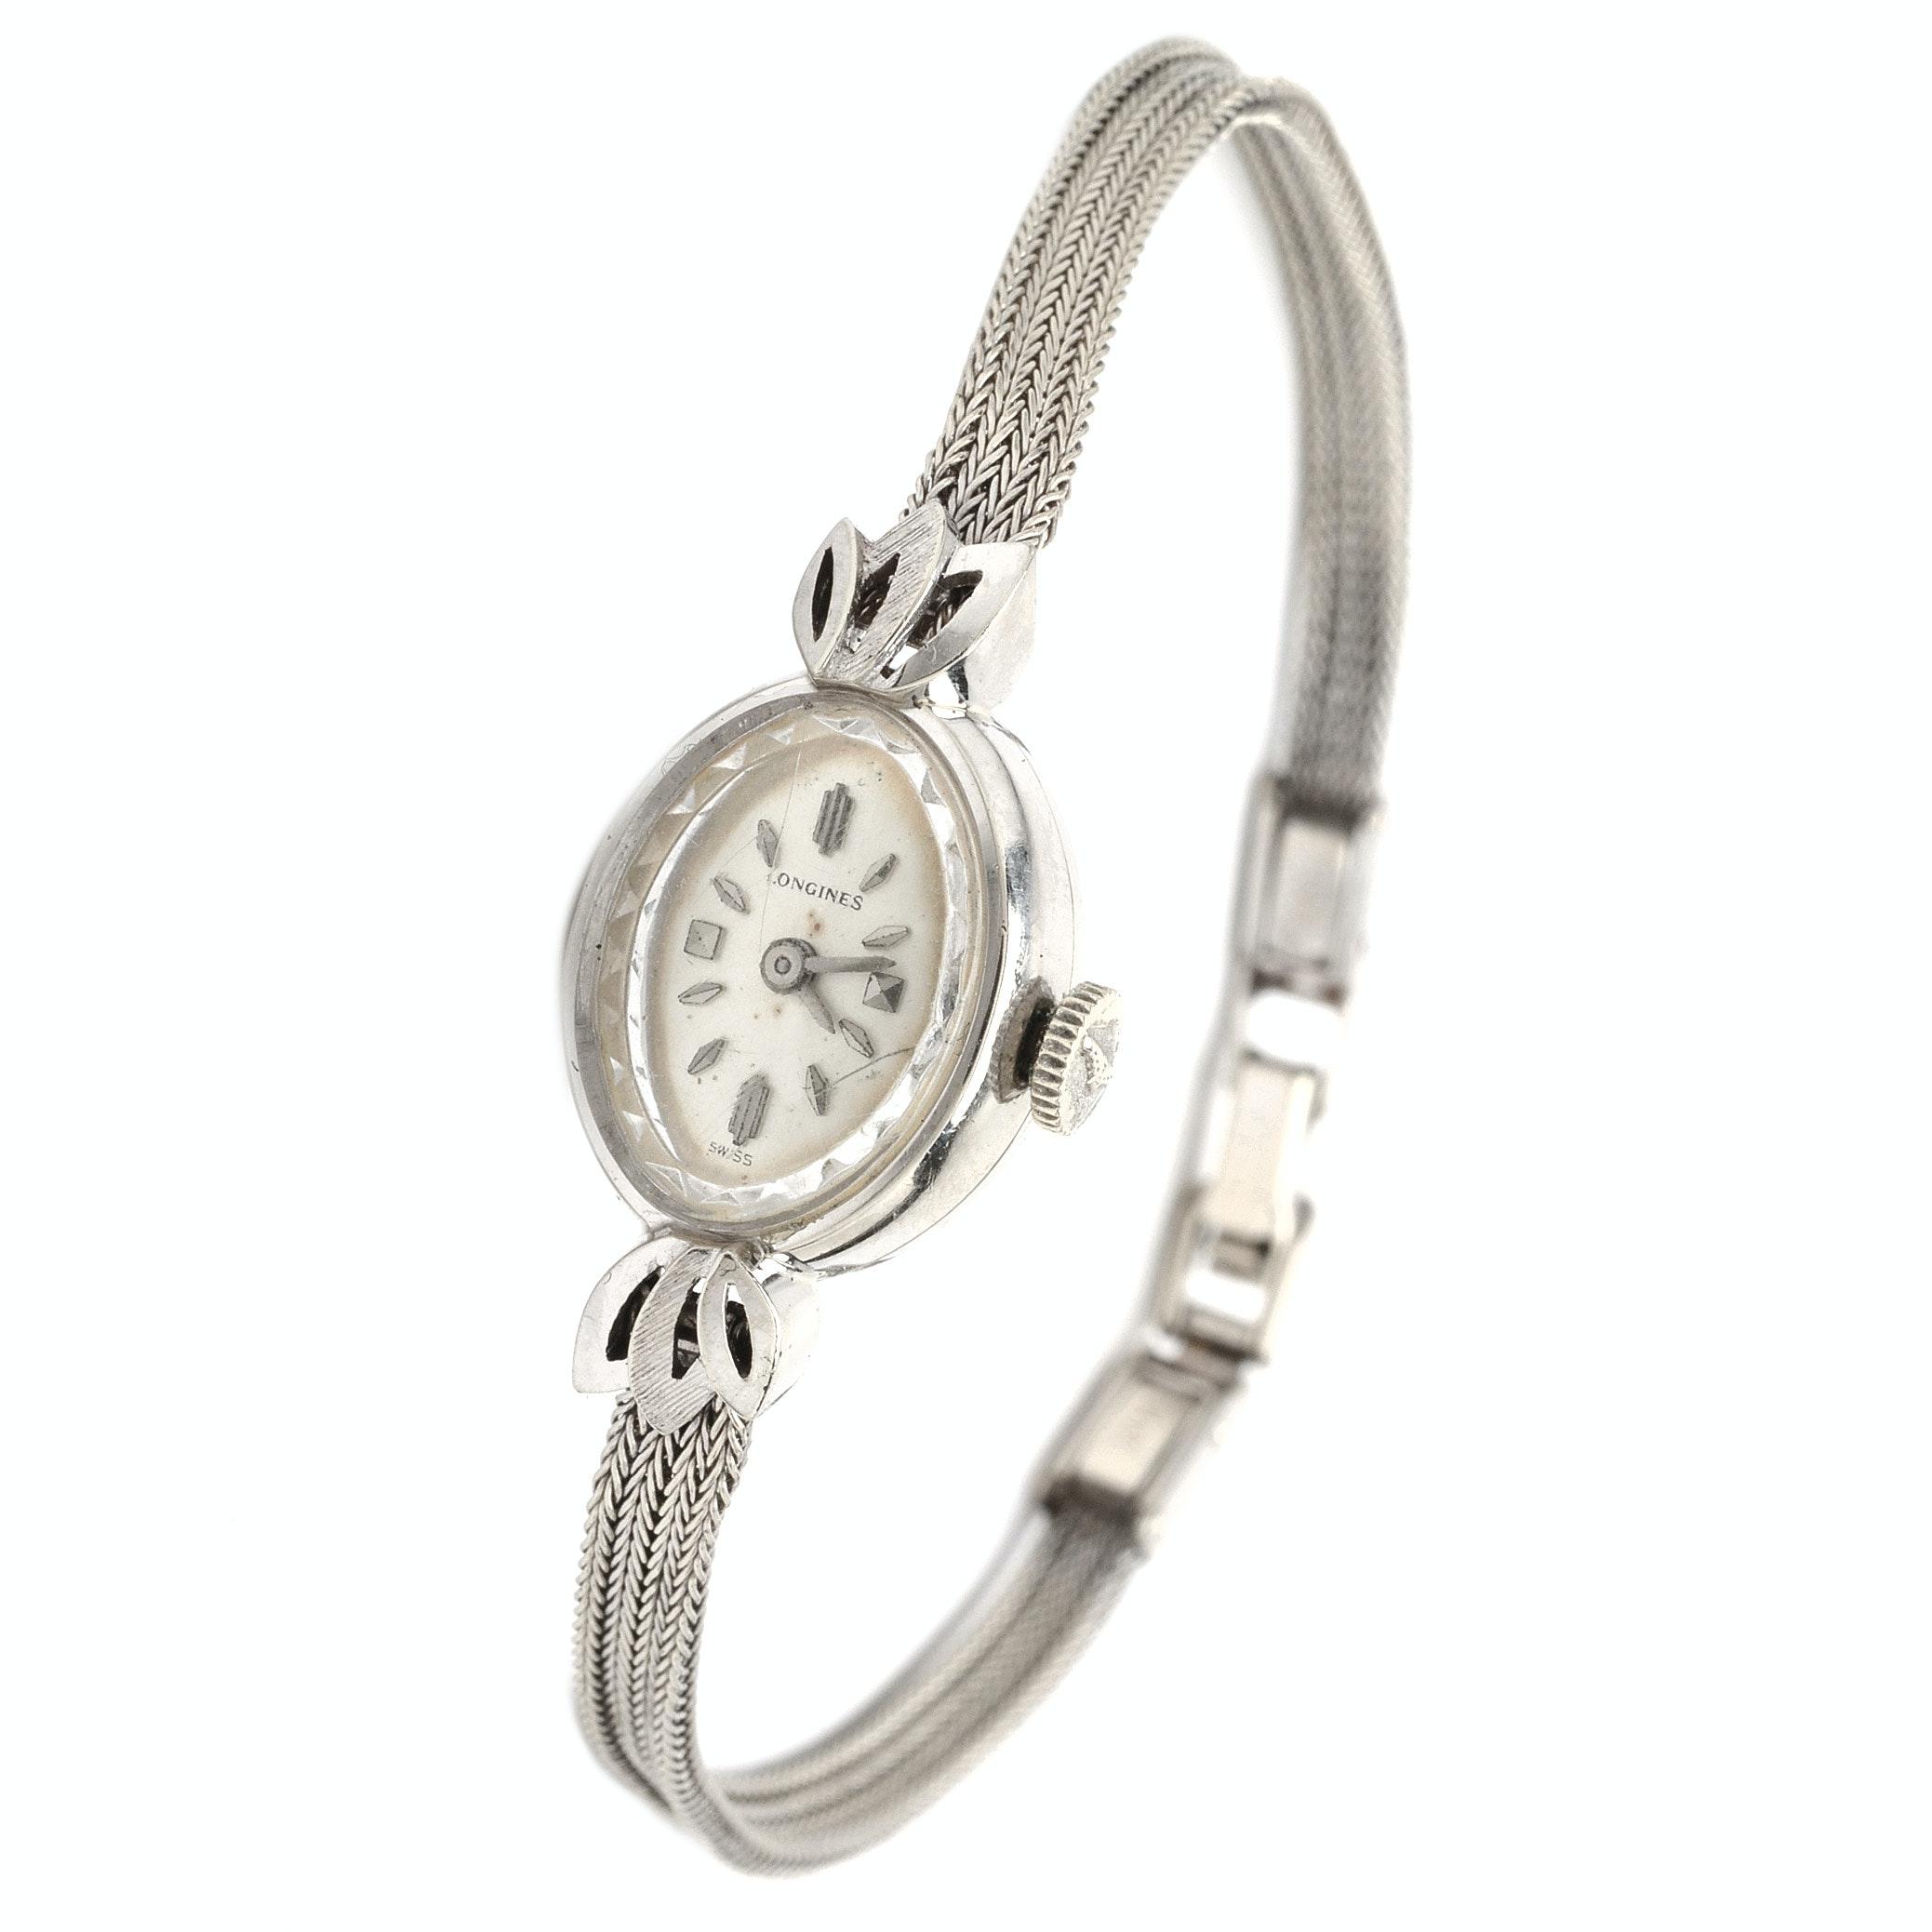 Longines 14K White Gold Wristwatch